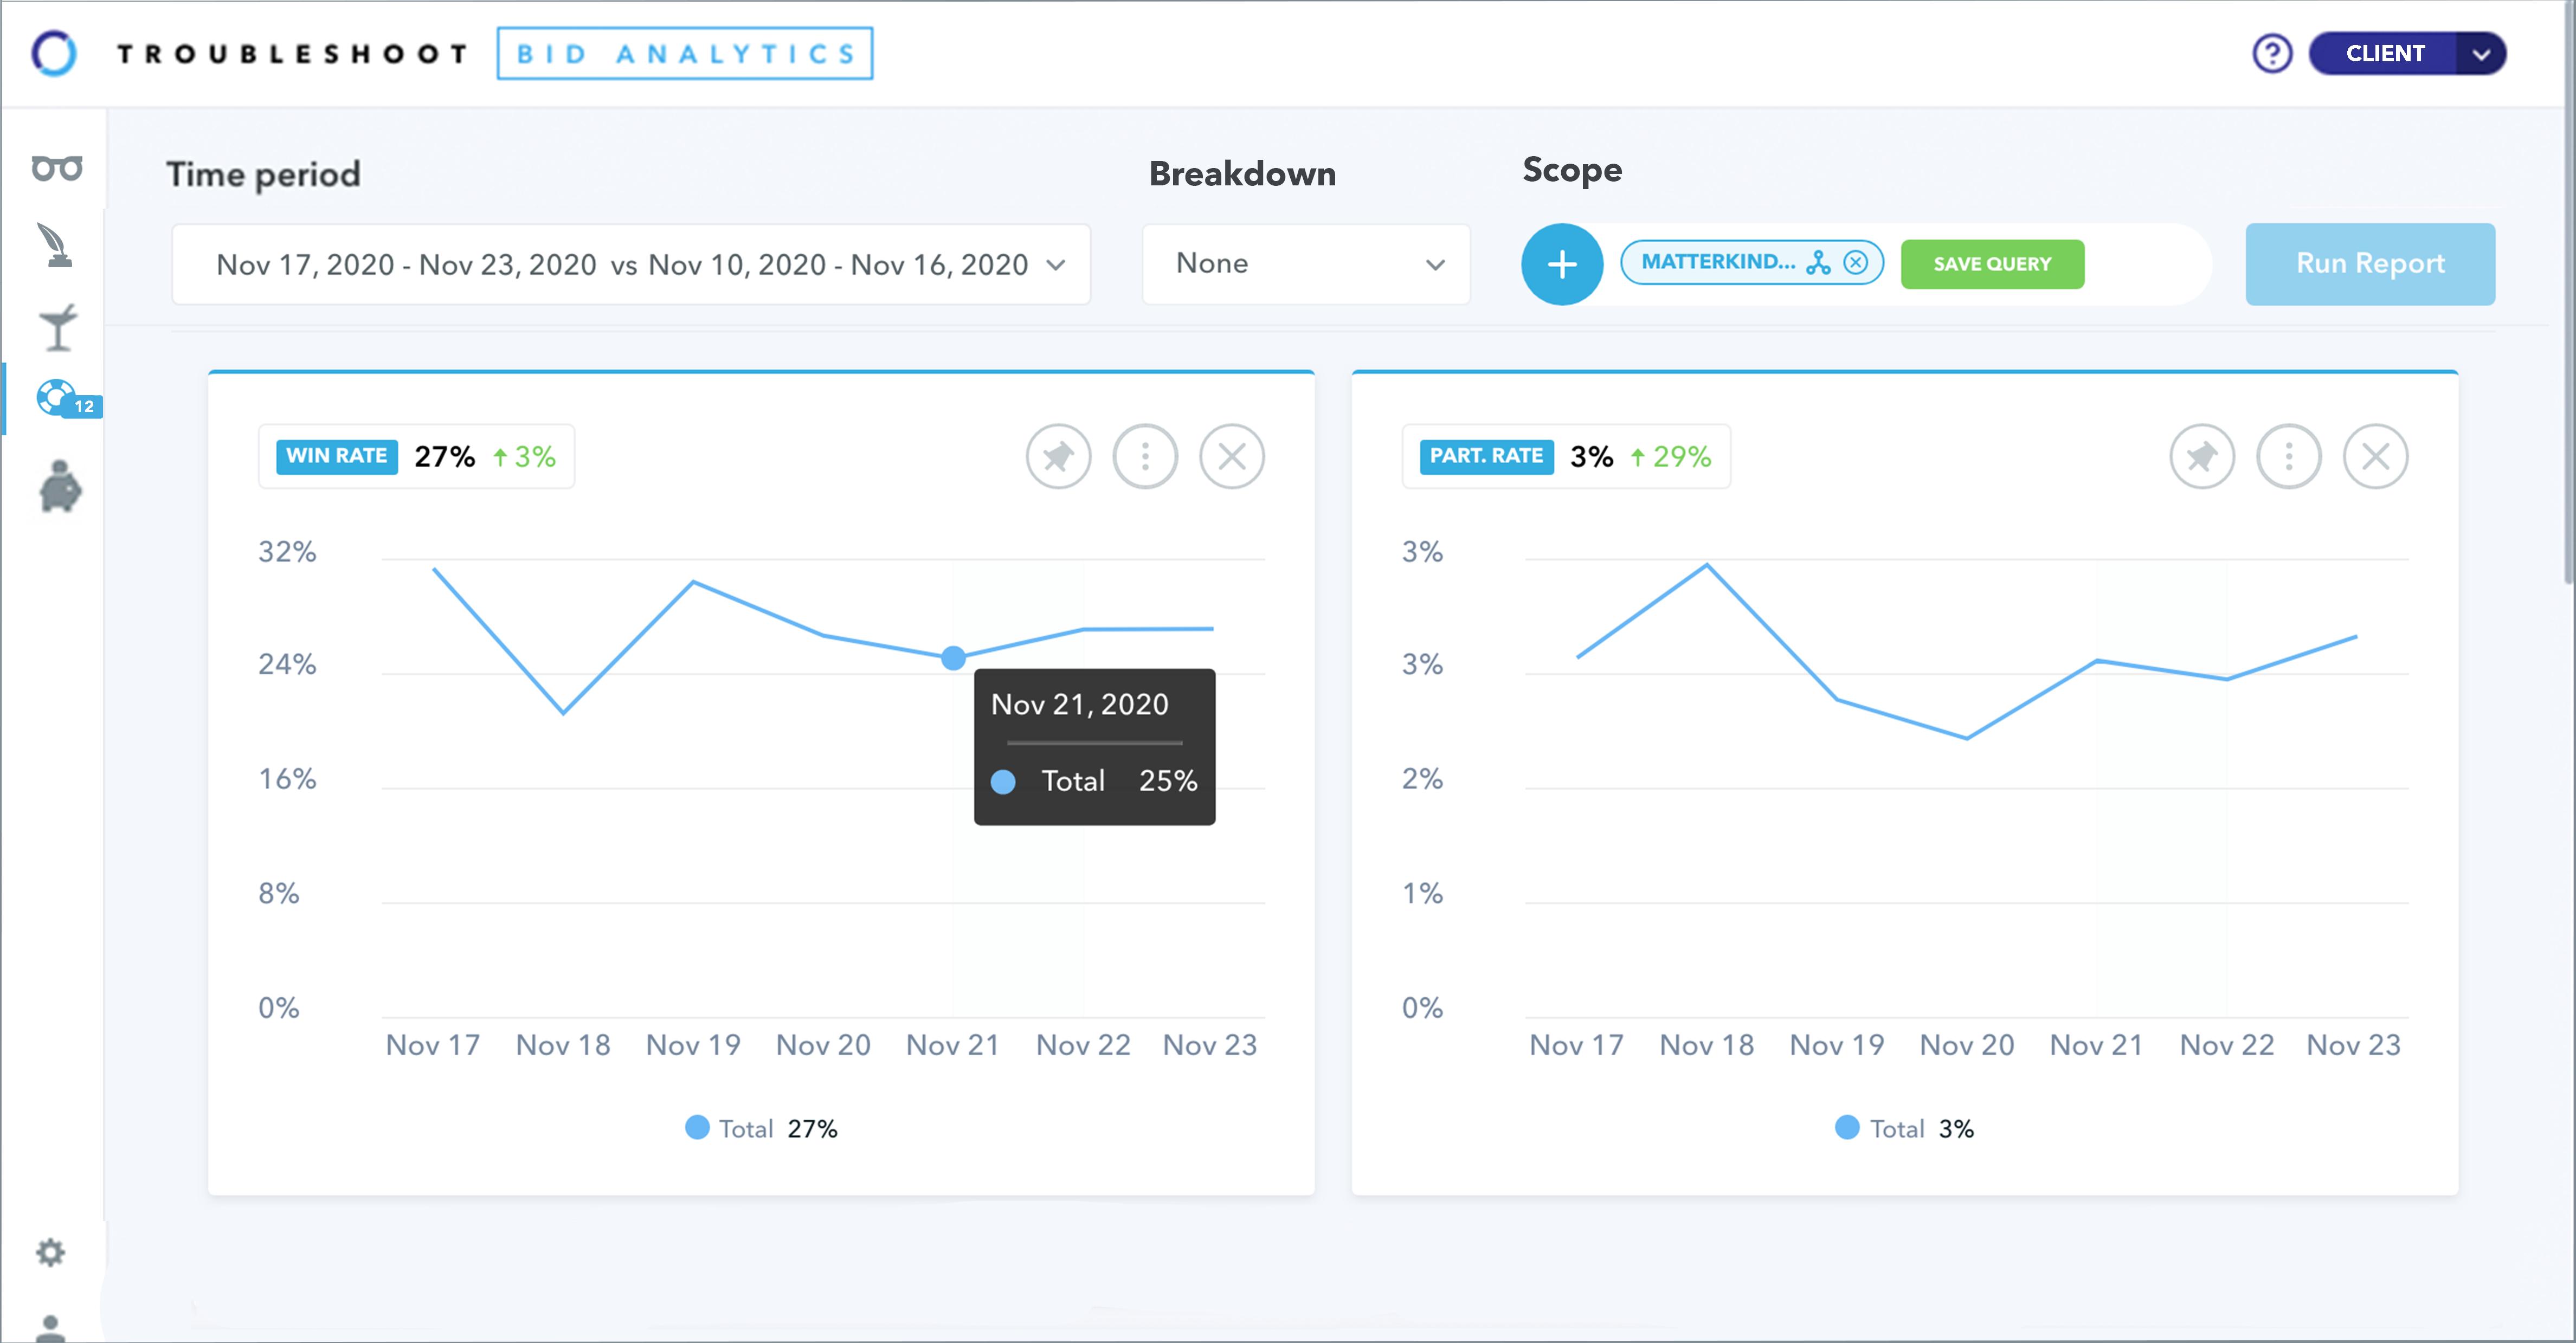 Adomik Troubleshoot App metrics - fix the hidden programmatic issues